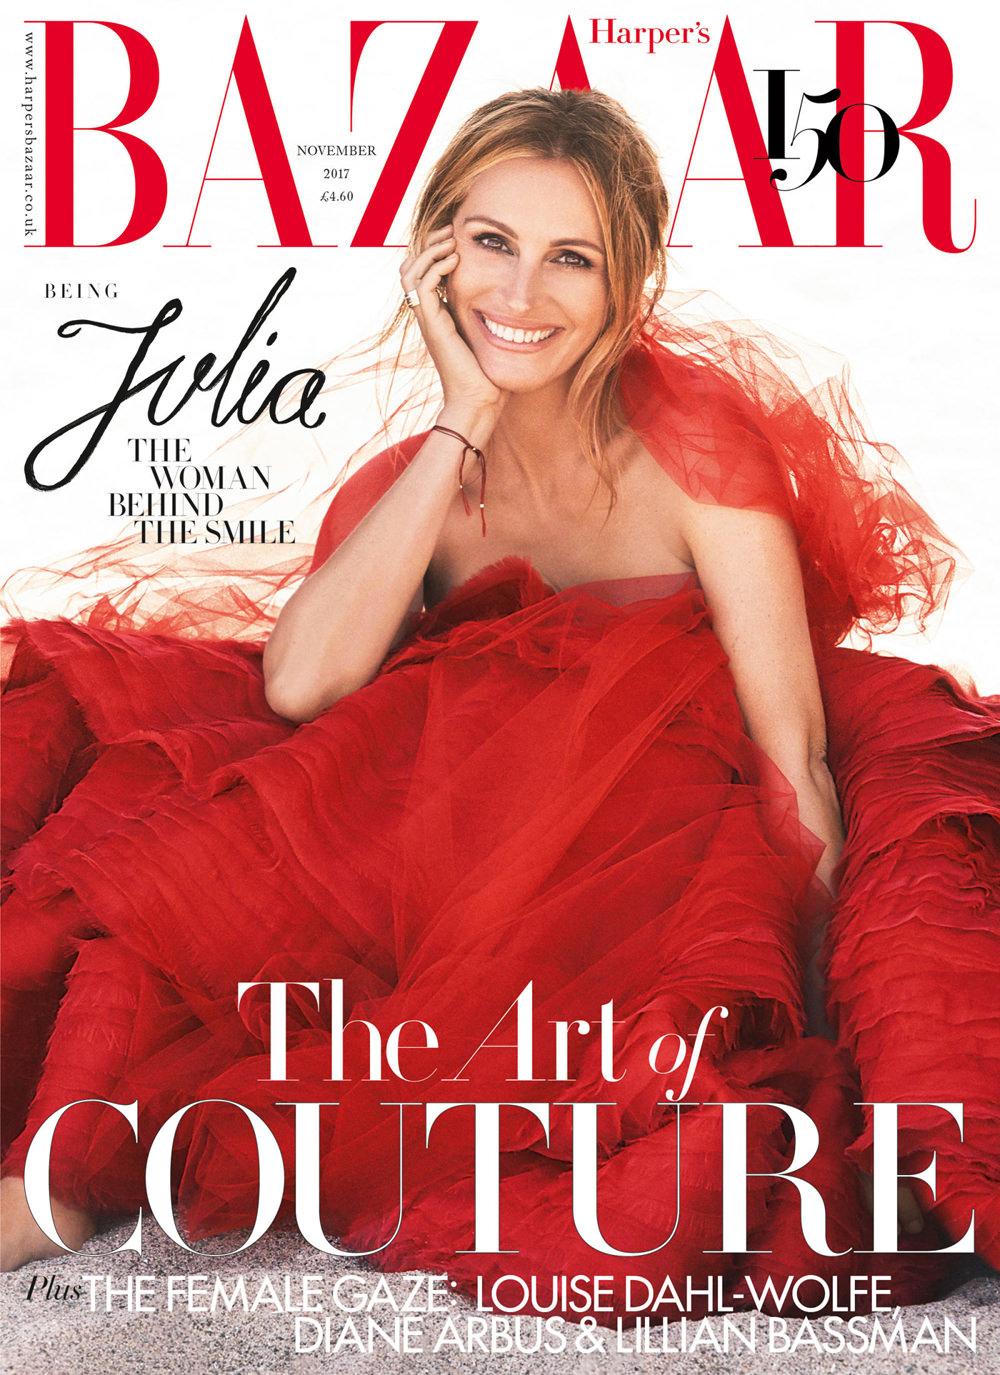 Julia-Roberts-Harpers-Bazaar-November-2017-Issue-Fashion-Tom-Lorenzo-Site-1.jpg